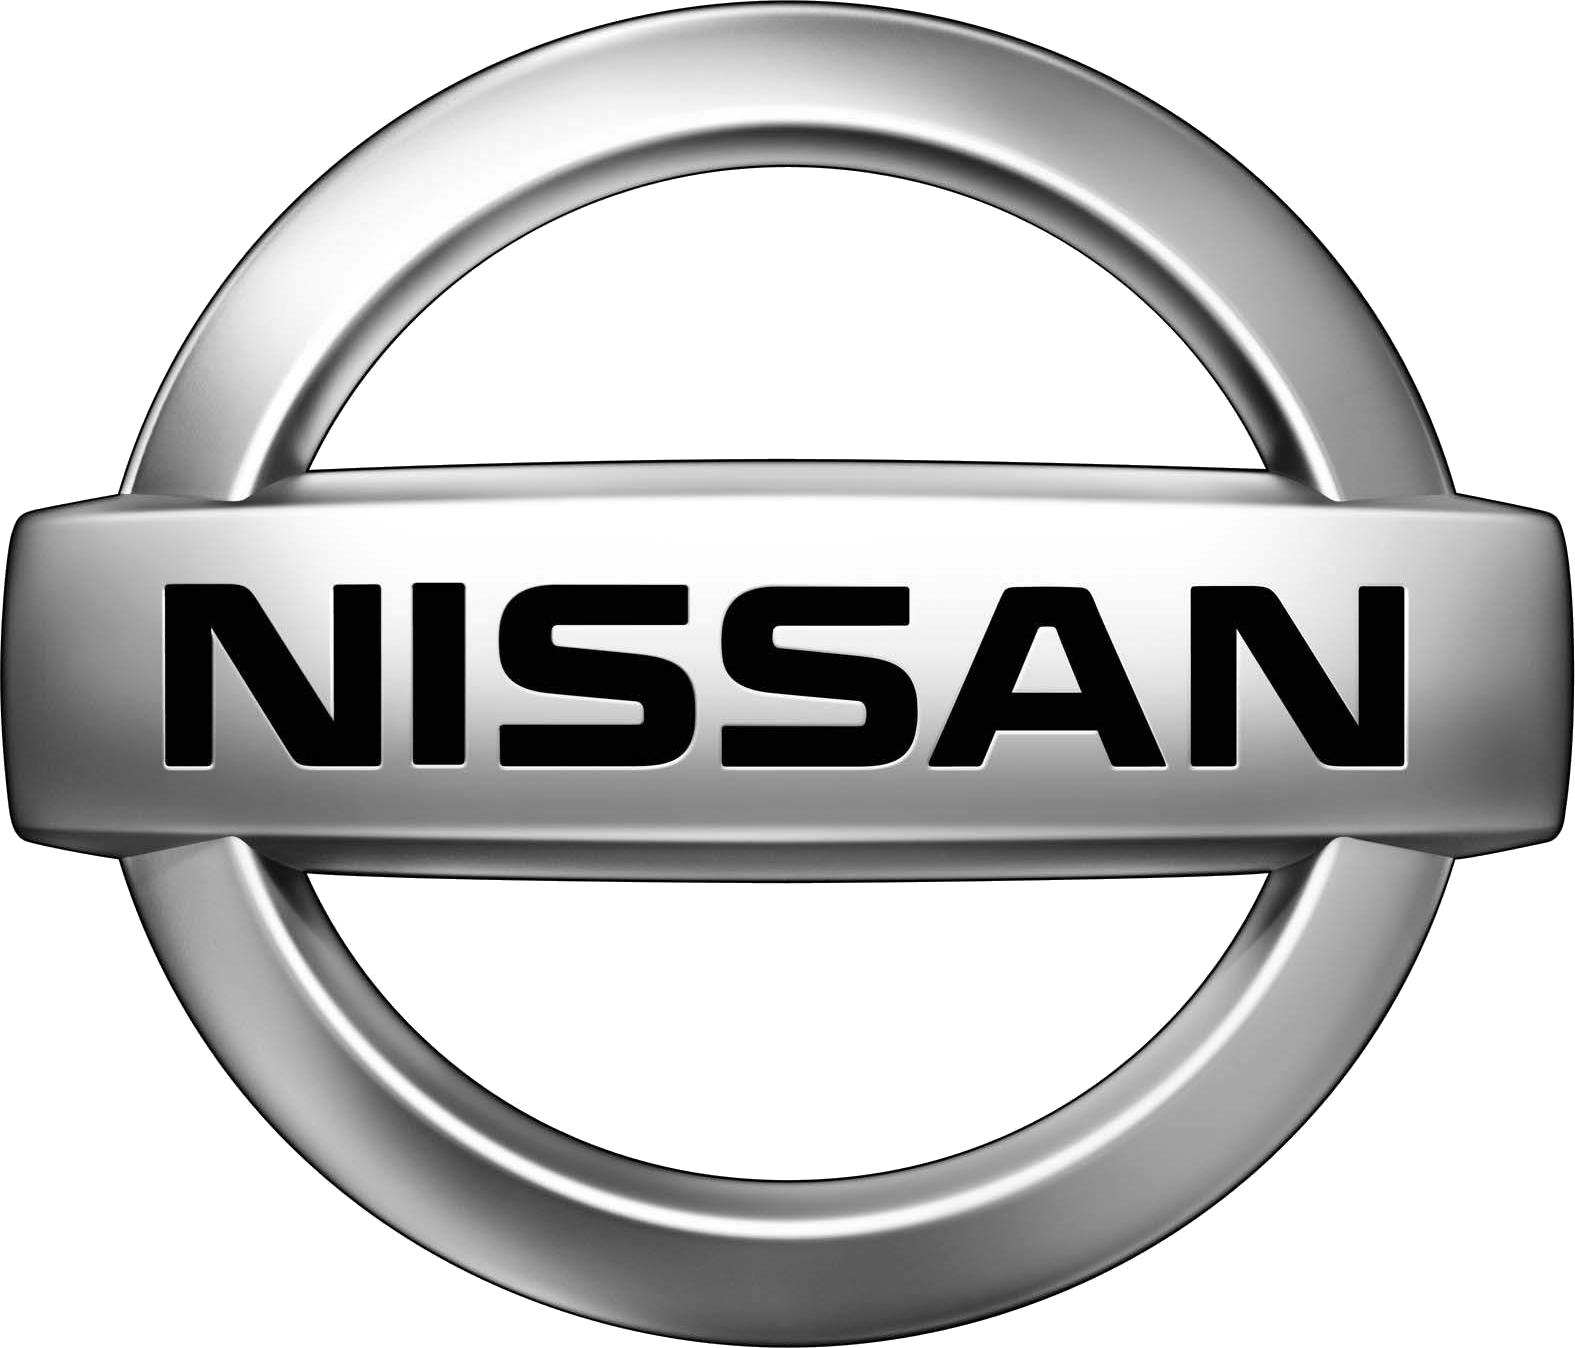 Ниссан логотип PNG, Nissan car logo PNG